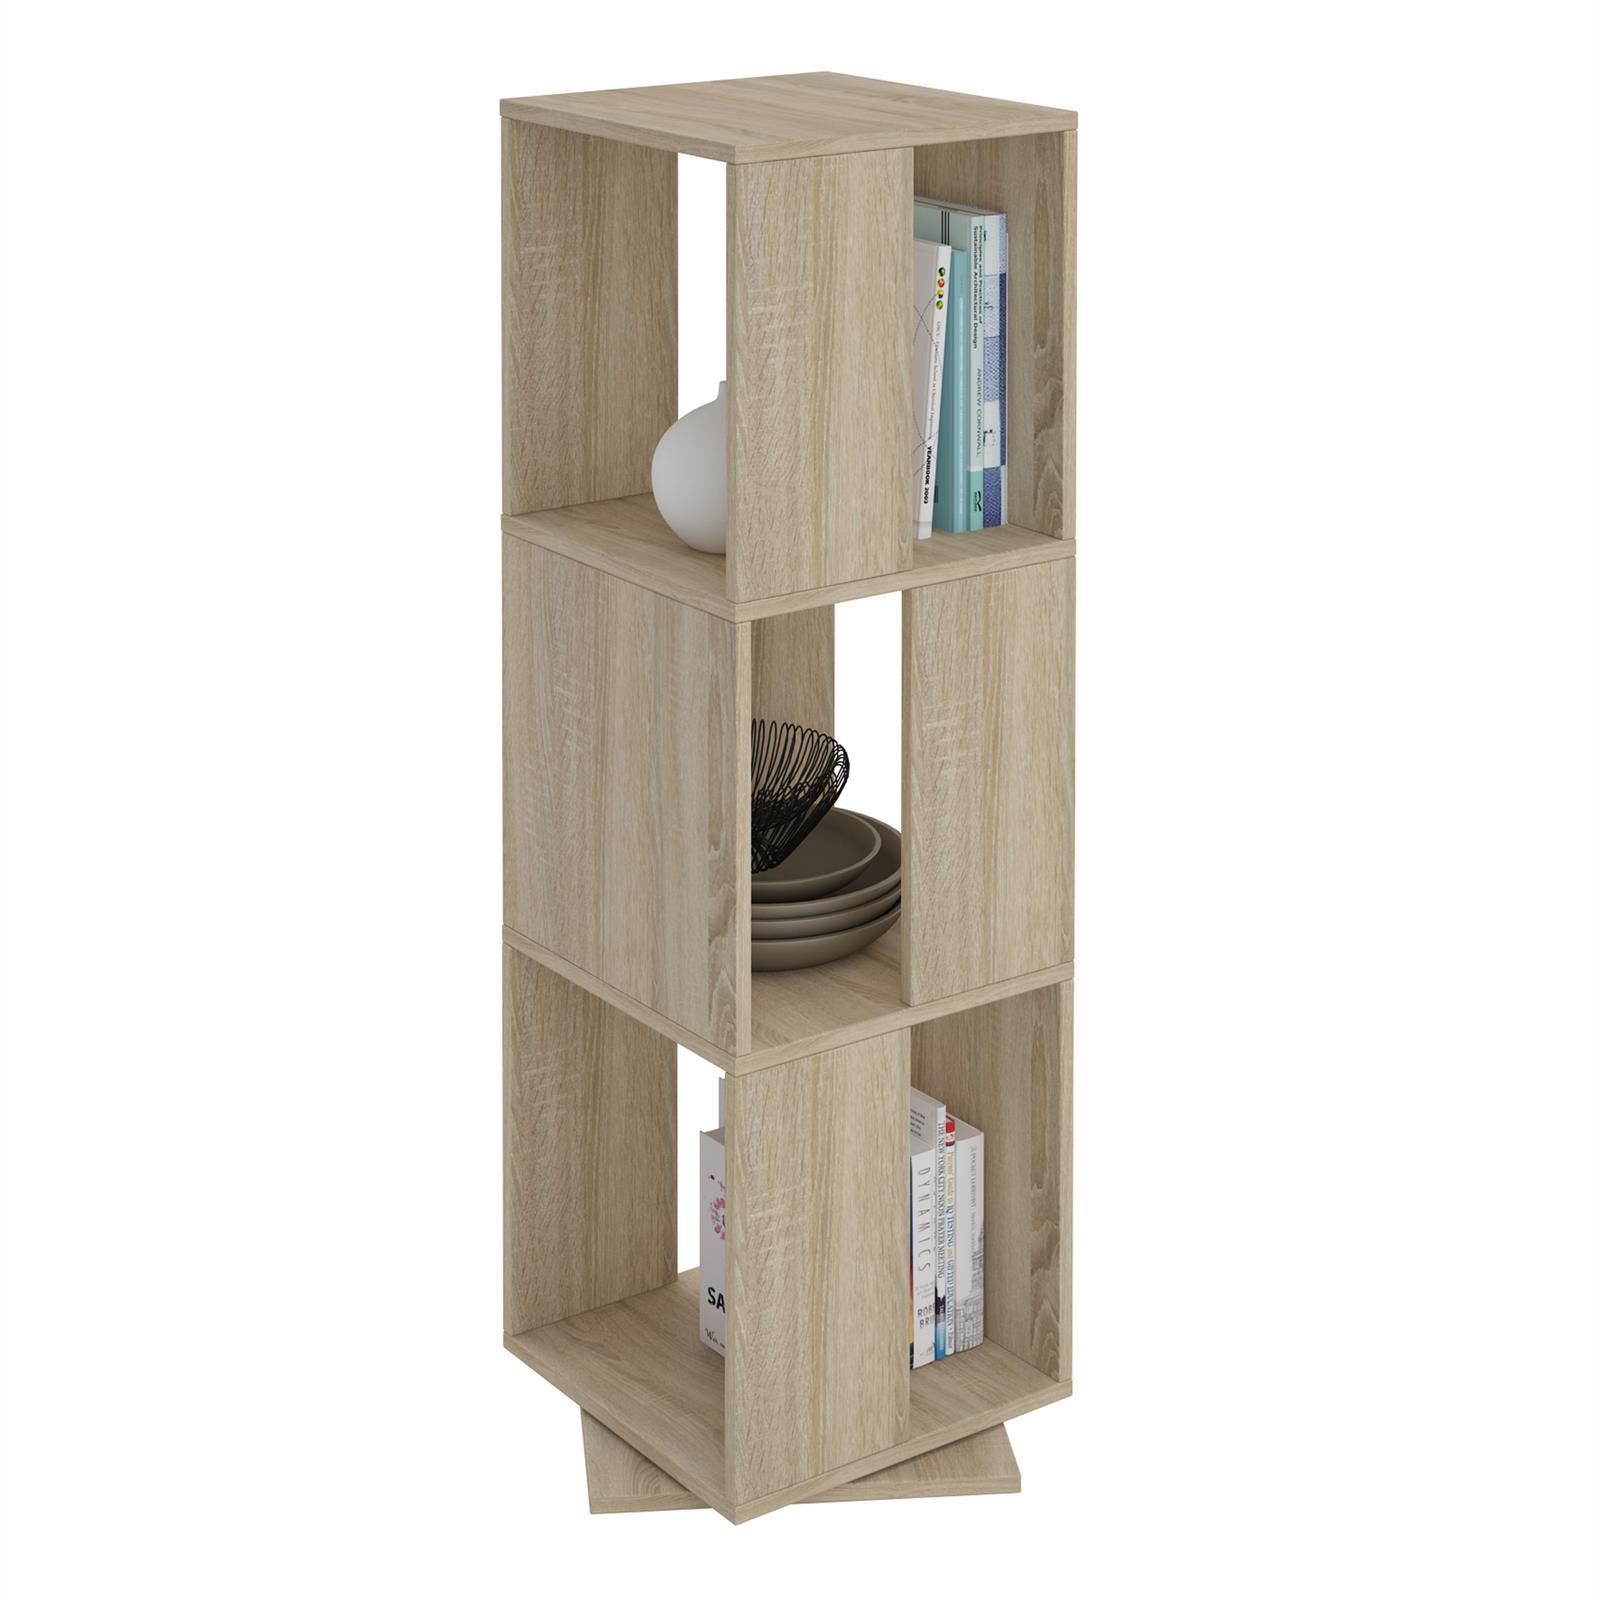 drehregal b cherregal deko regal b ro ordner drehbar mit 3 f chern 5 farben ebay. Black Bedroom Furniture Sets. Home Design Ideas